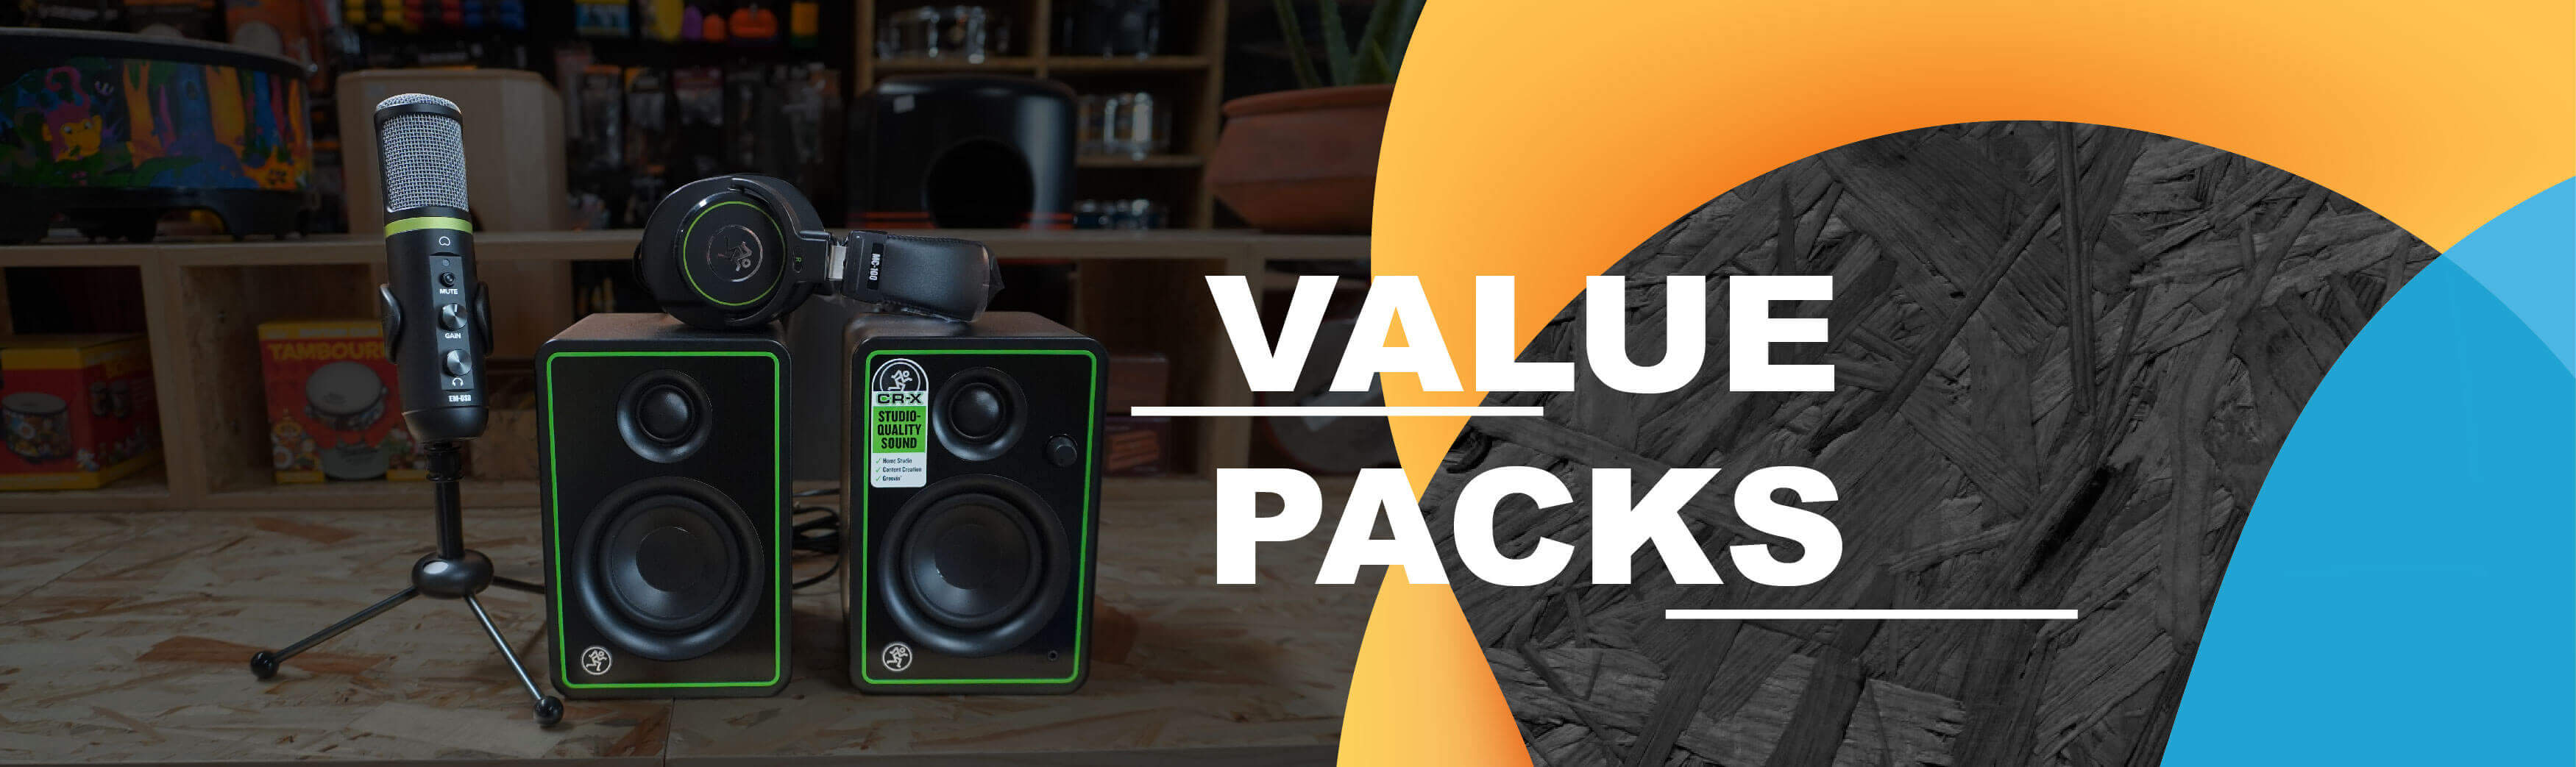 Value Packs for music | Melody House UAE Dubai